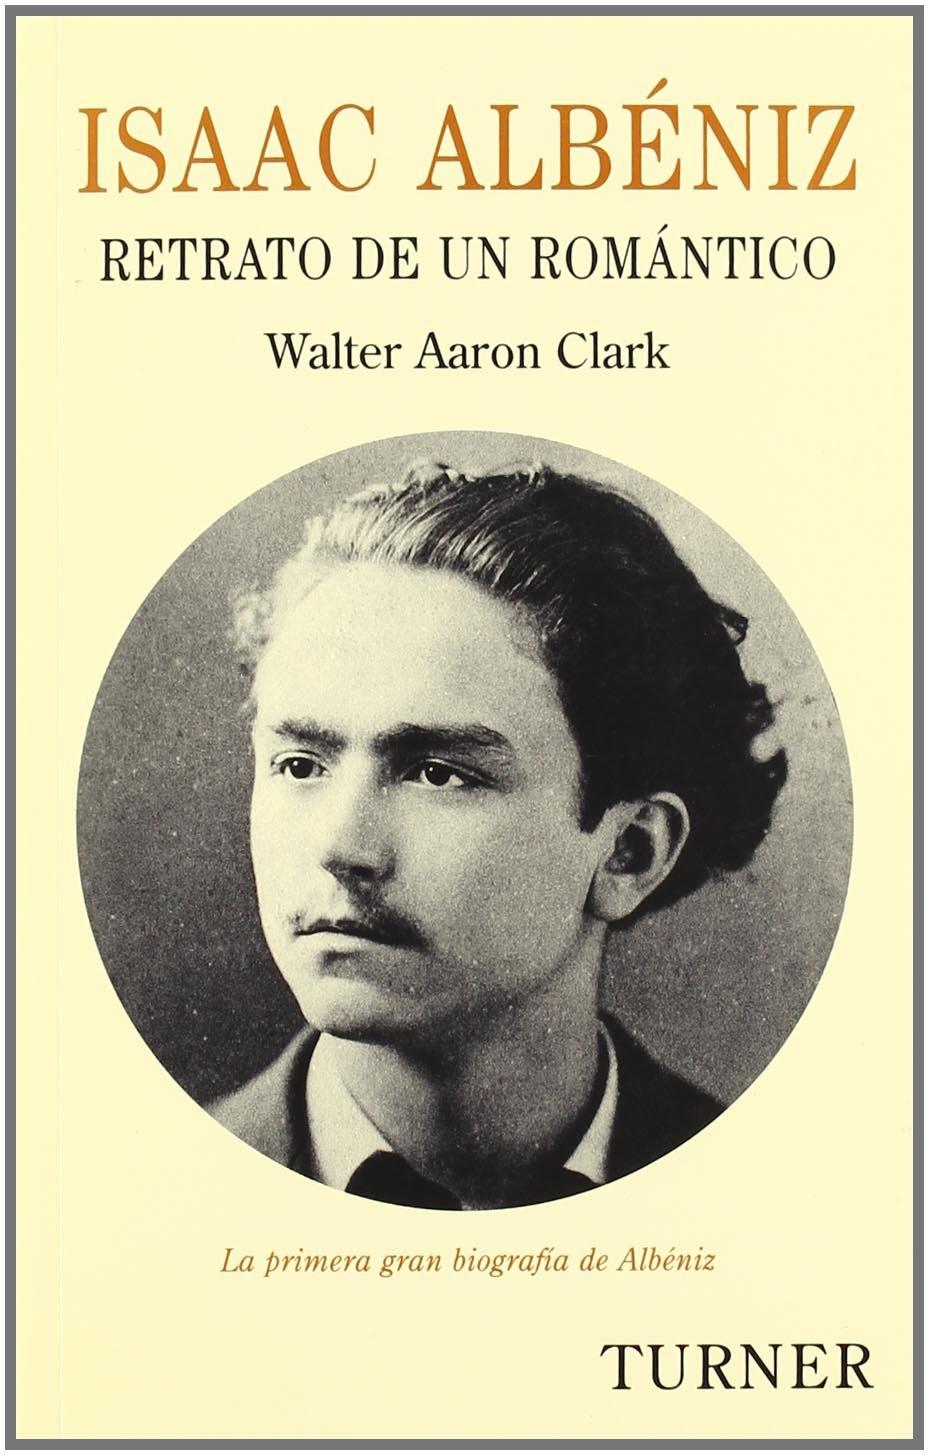 Isaac Albéniz: Retrato de un romántico Turner Música: Amazon.es: Walter Aaron Clark, Paul Silles: Libros